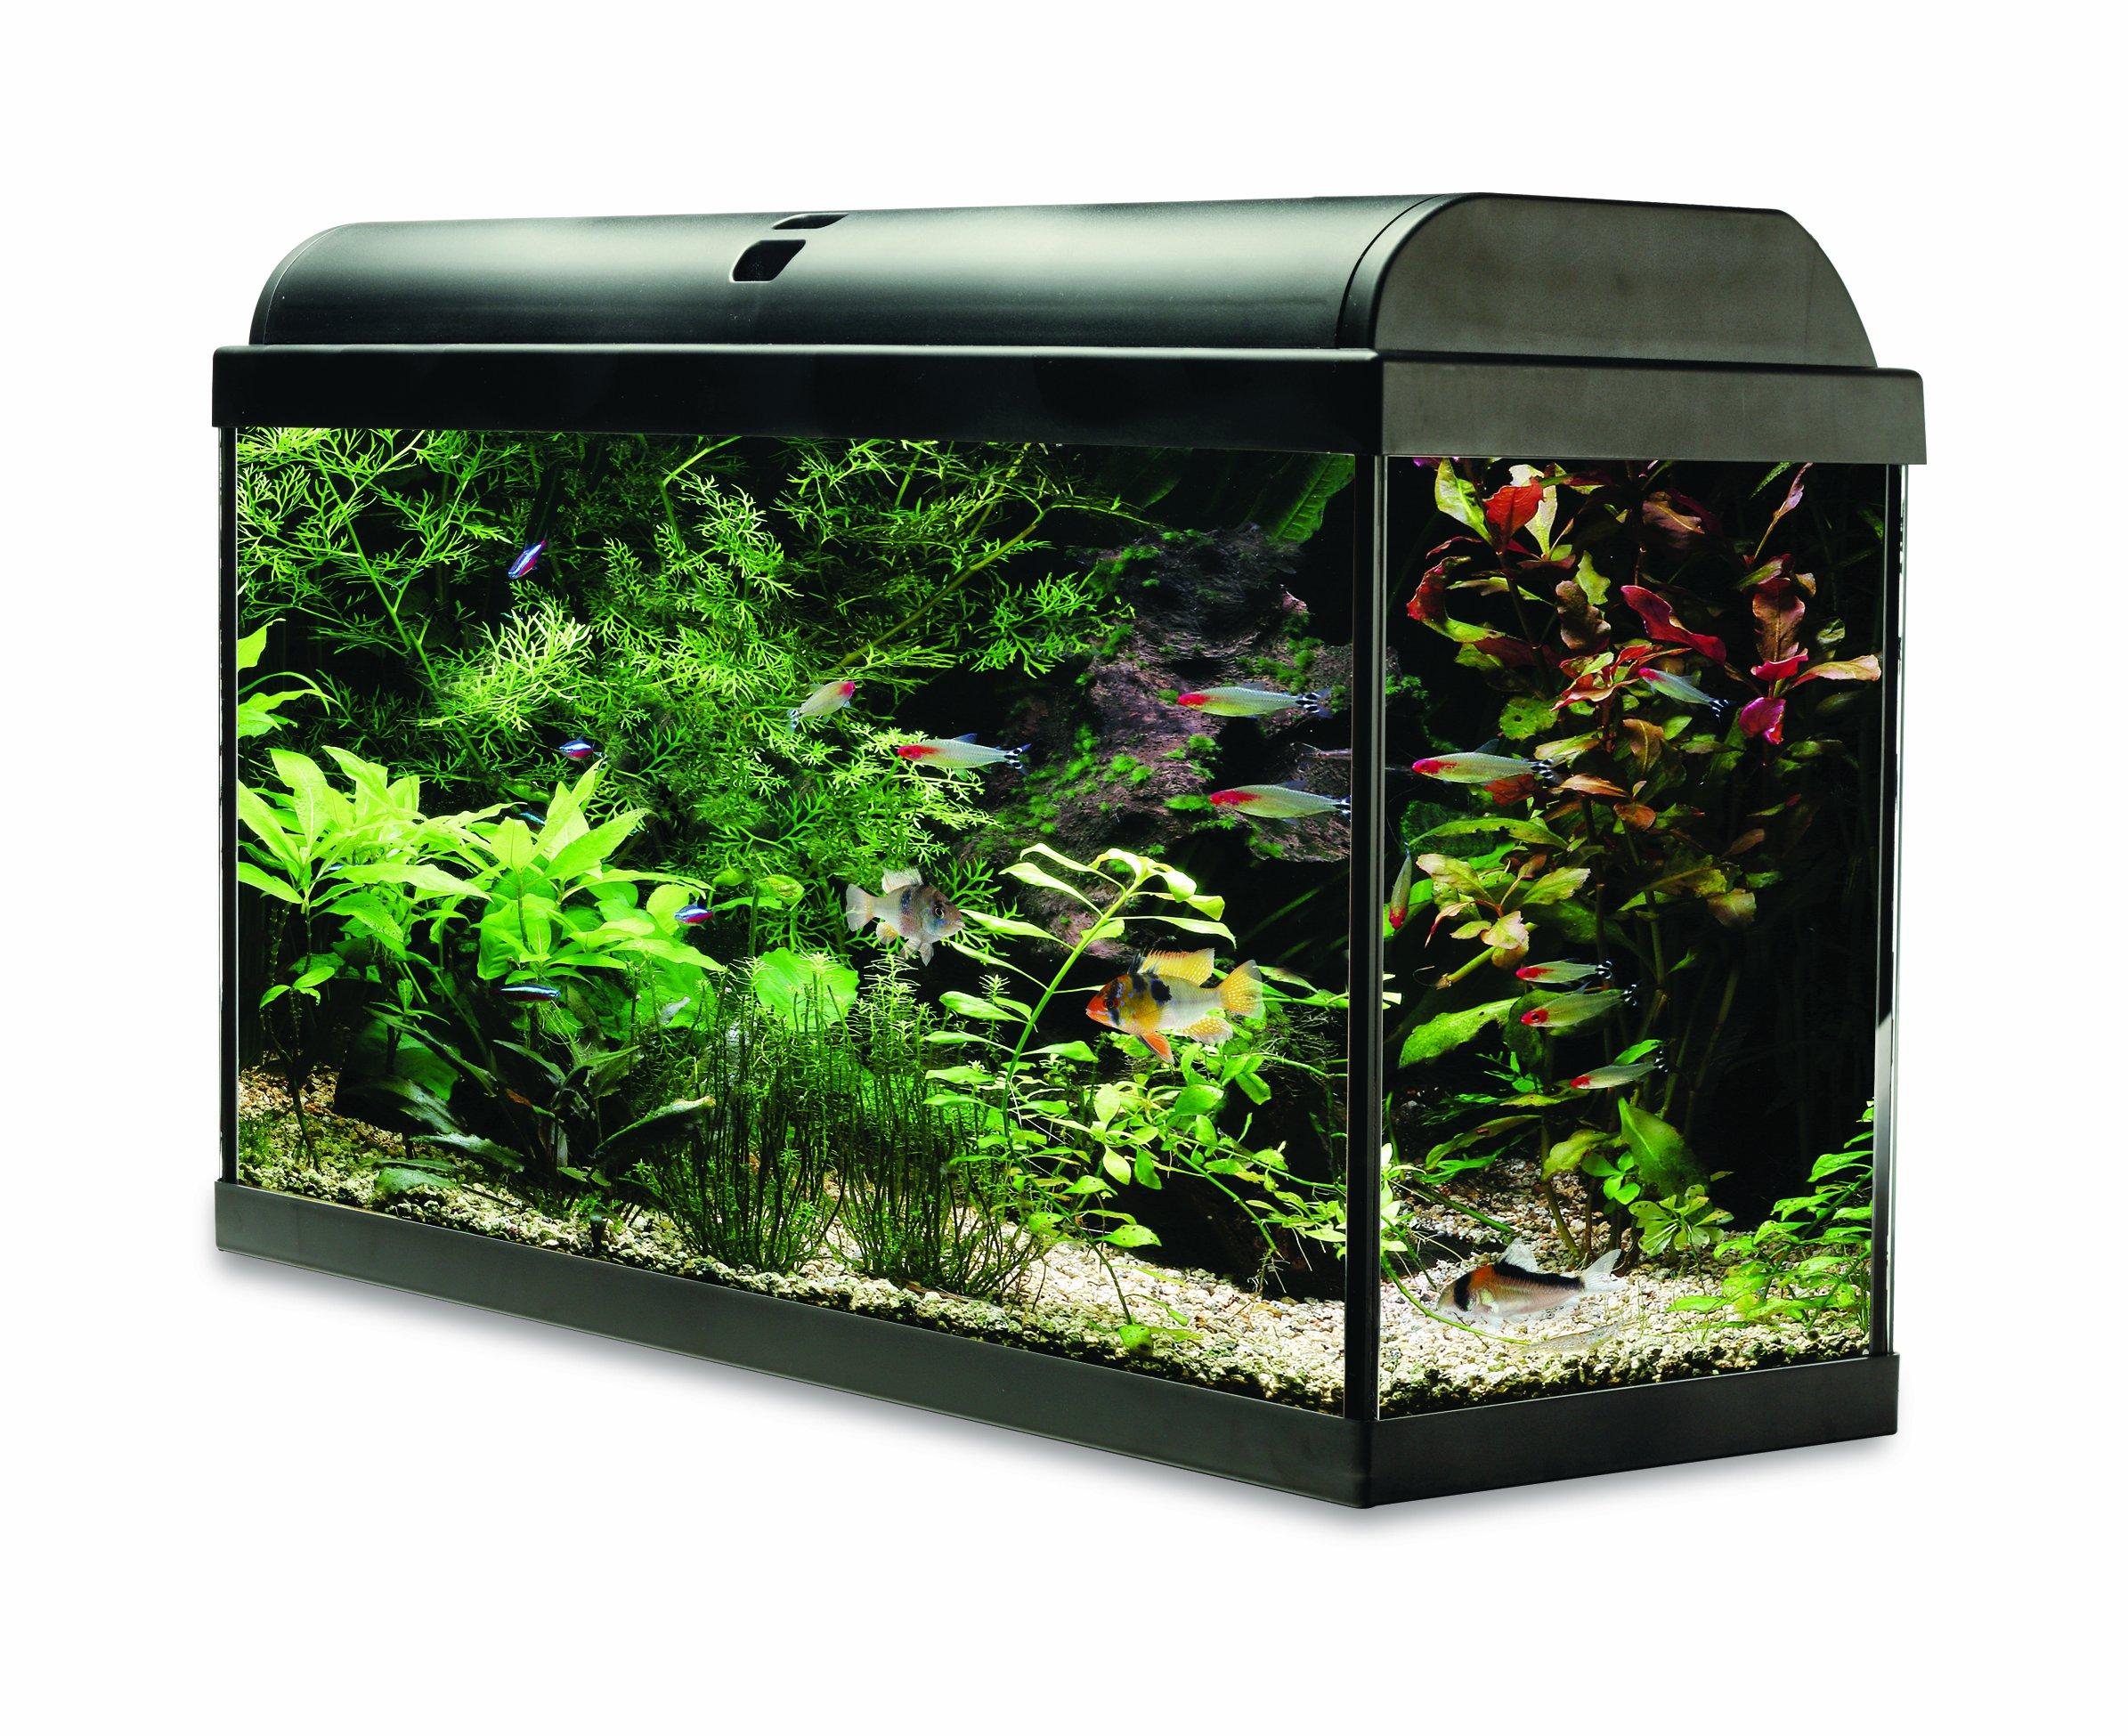 Interpet Aquaverse Glass Aquarium Fish Tank Premium Kit- 65 L